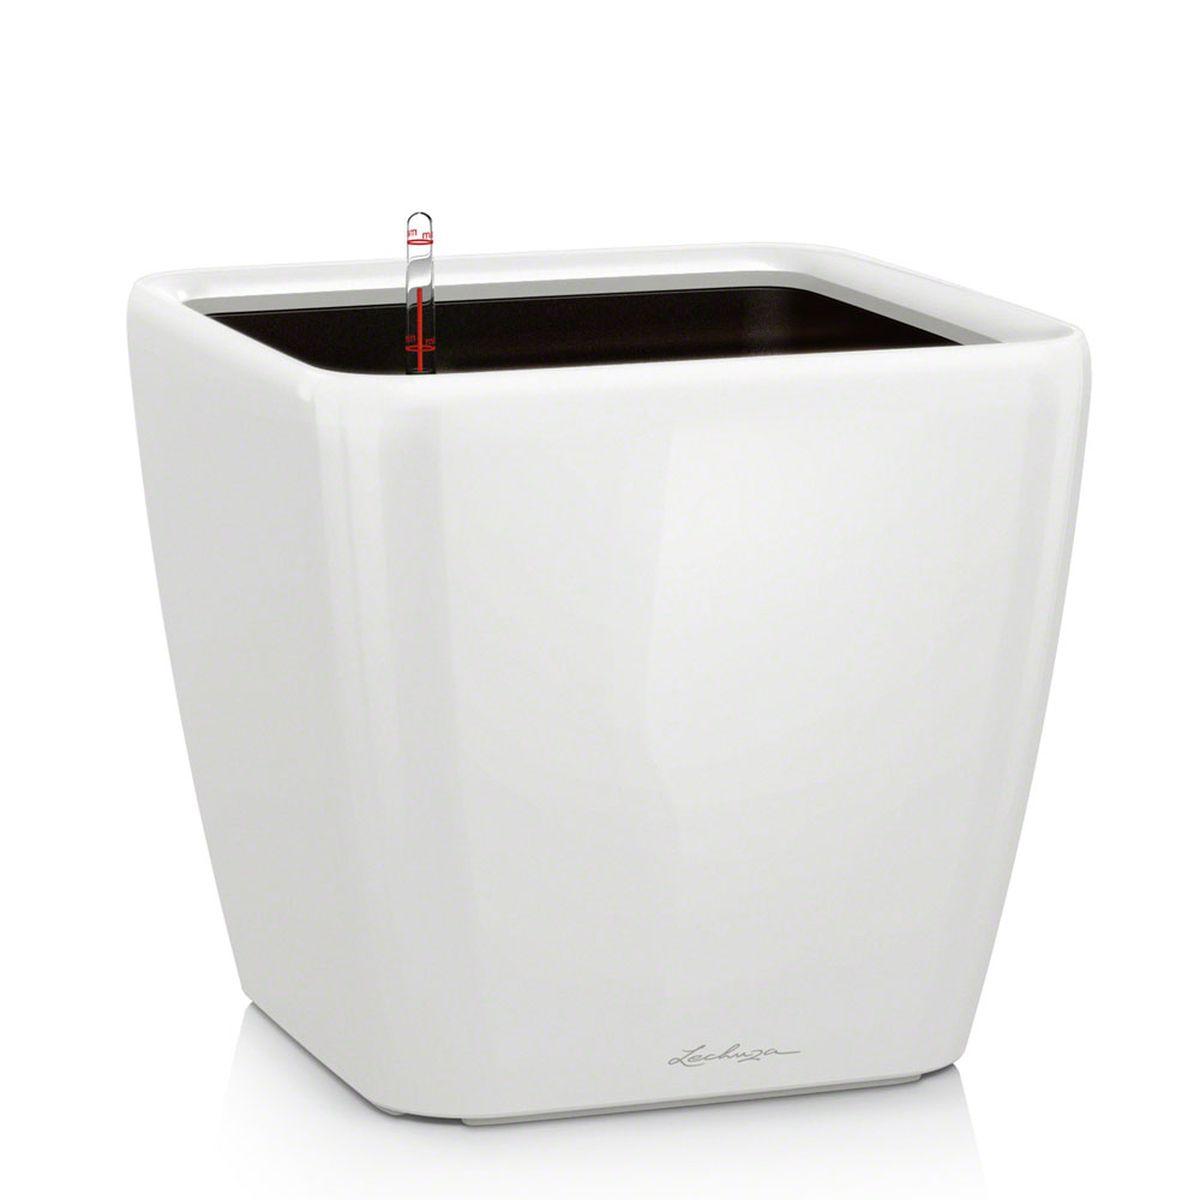 Кашпо Lechuza Quadro, с системой автополива, цвет: белый, 33 х 33 х 35 см quadro сумки